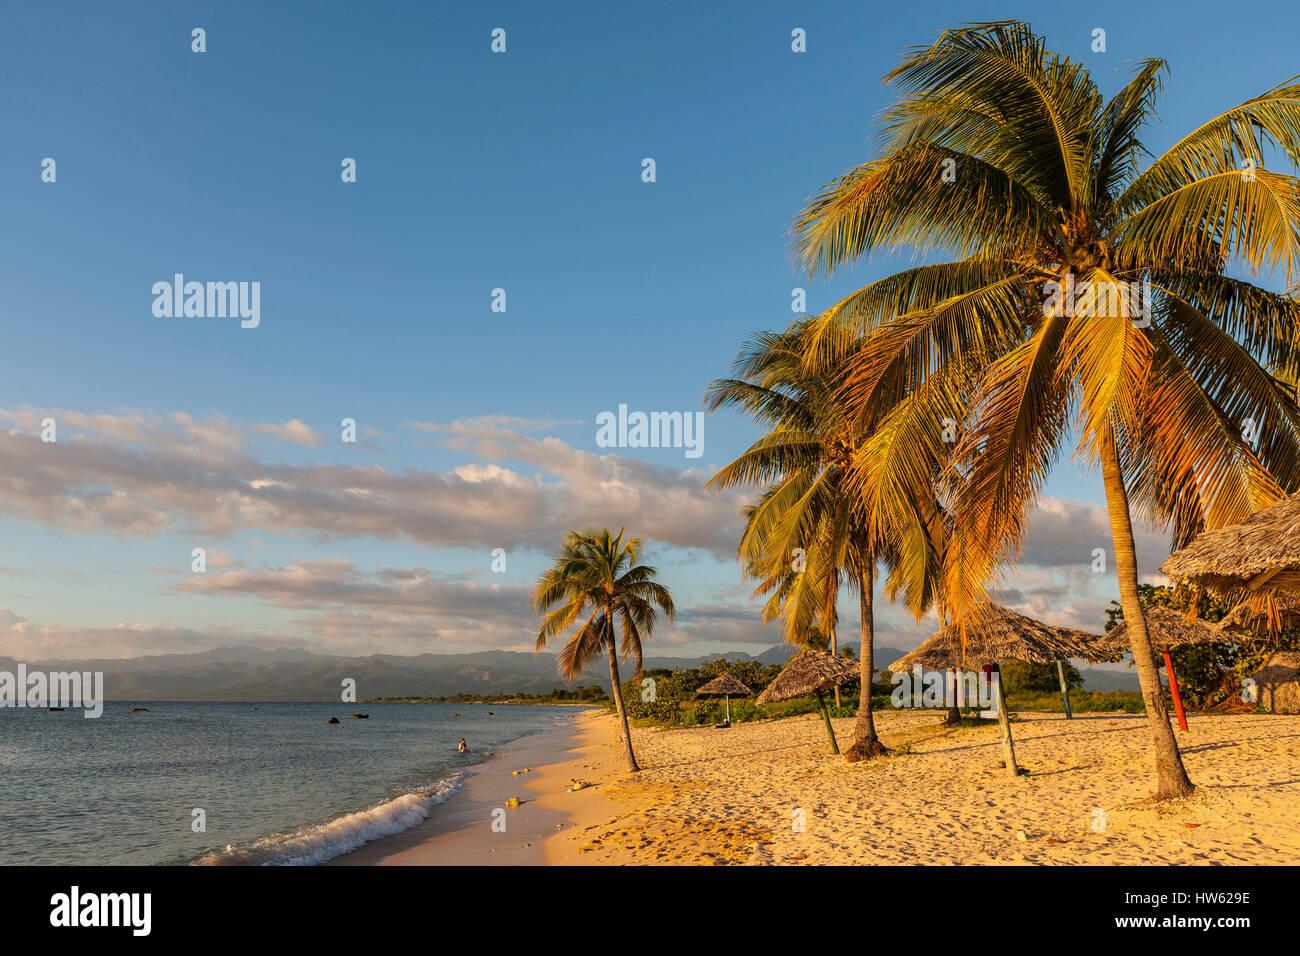 Cuba, Sancti Spiritus province, Trinidad de Cuba, palm Playa Ancon - Stock Image